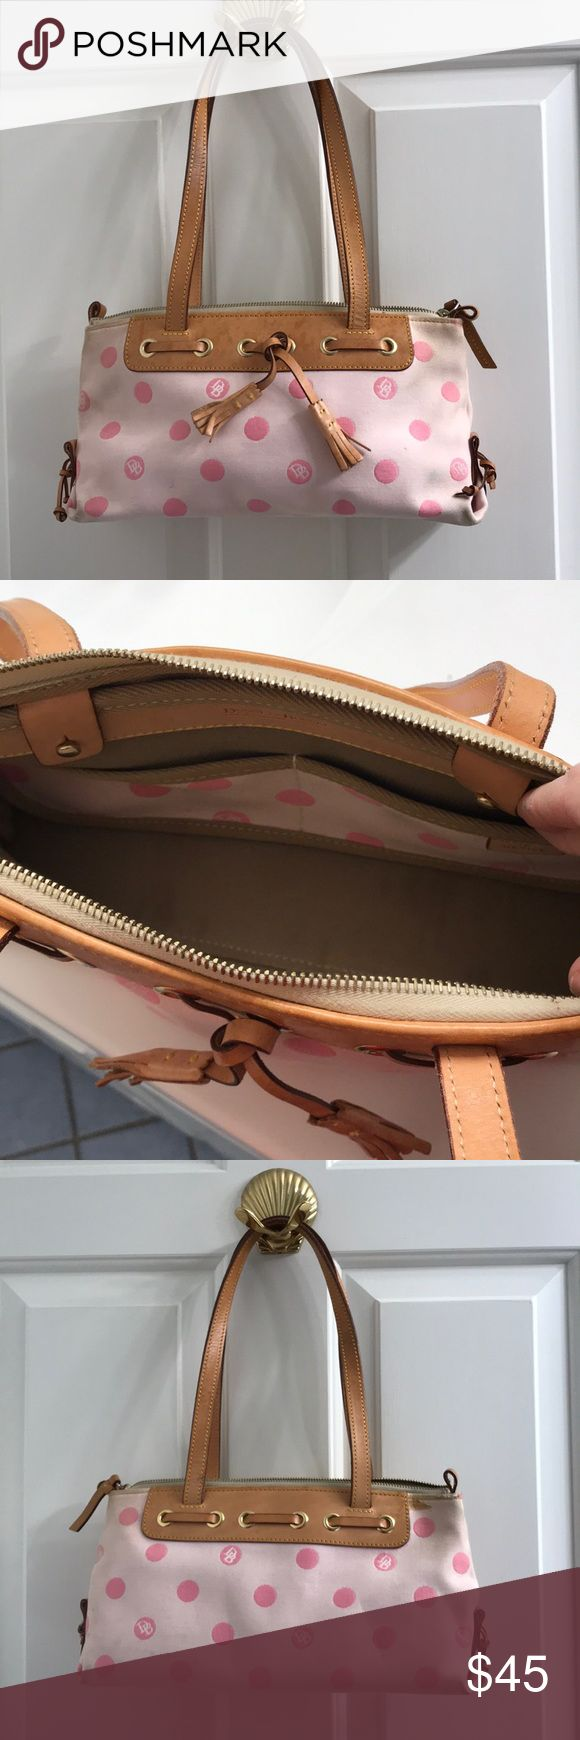 Dooney & Bourke authentic pink shoulder bag Dooney & Bourke authentic pink shoulder bag Dooney & Bourke Bags Shoulder Bags